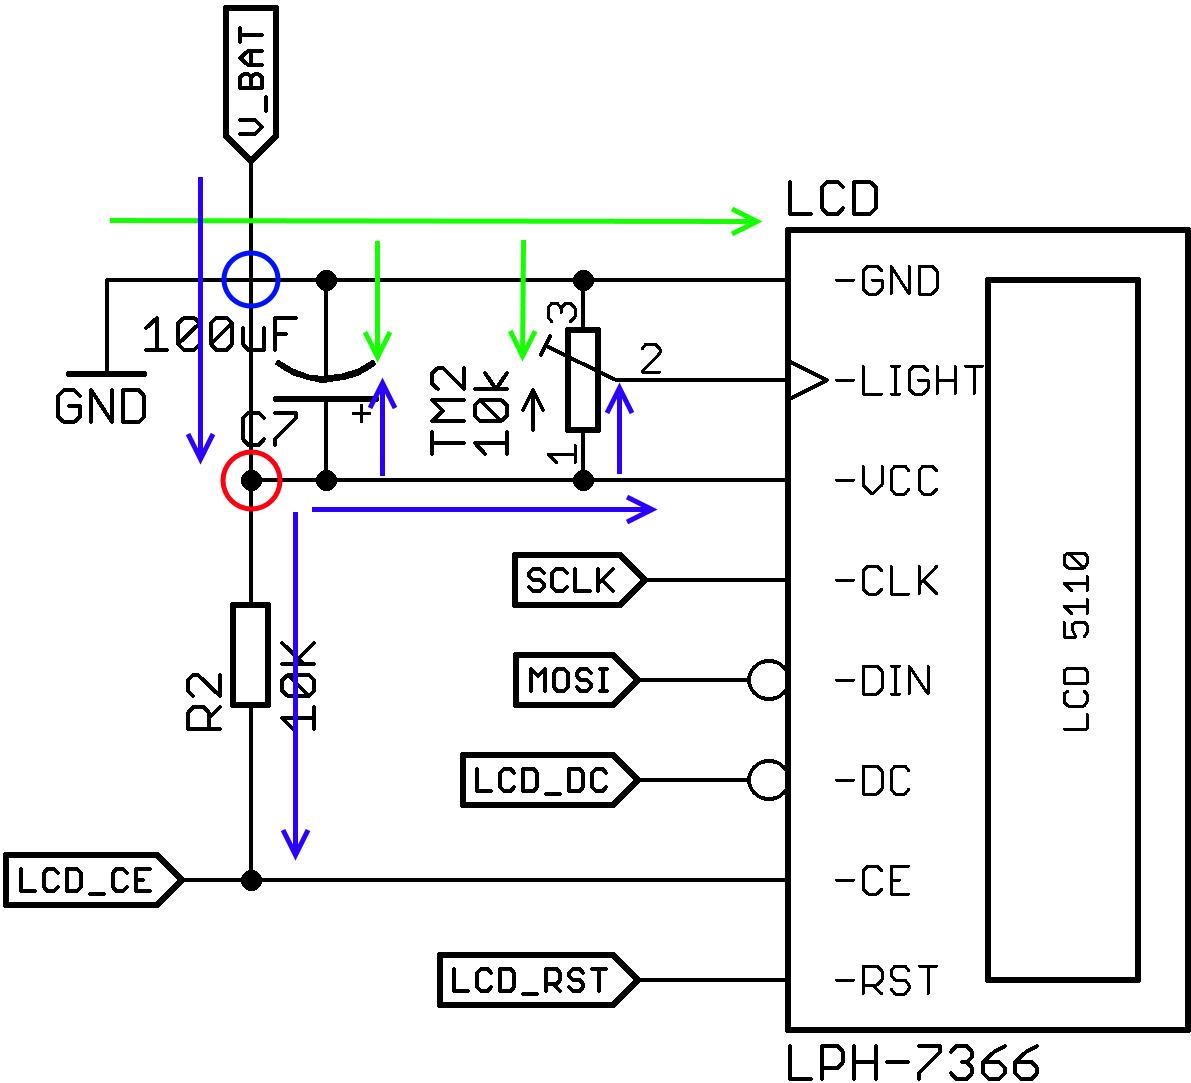 New guide - Reading electronics schematics - MAKERbuino updates ...